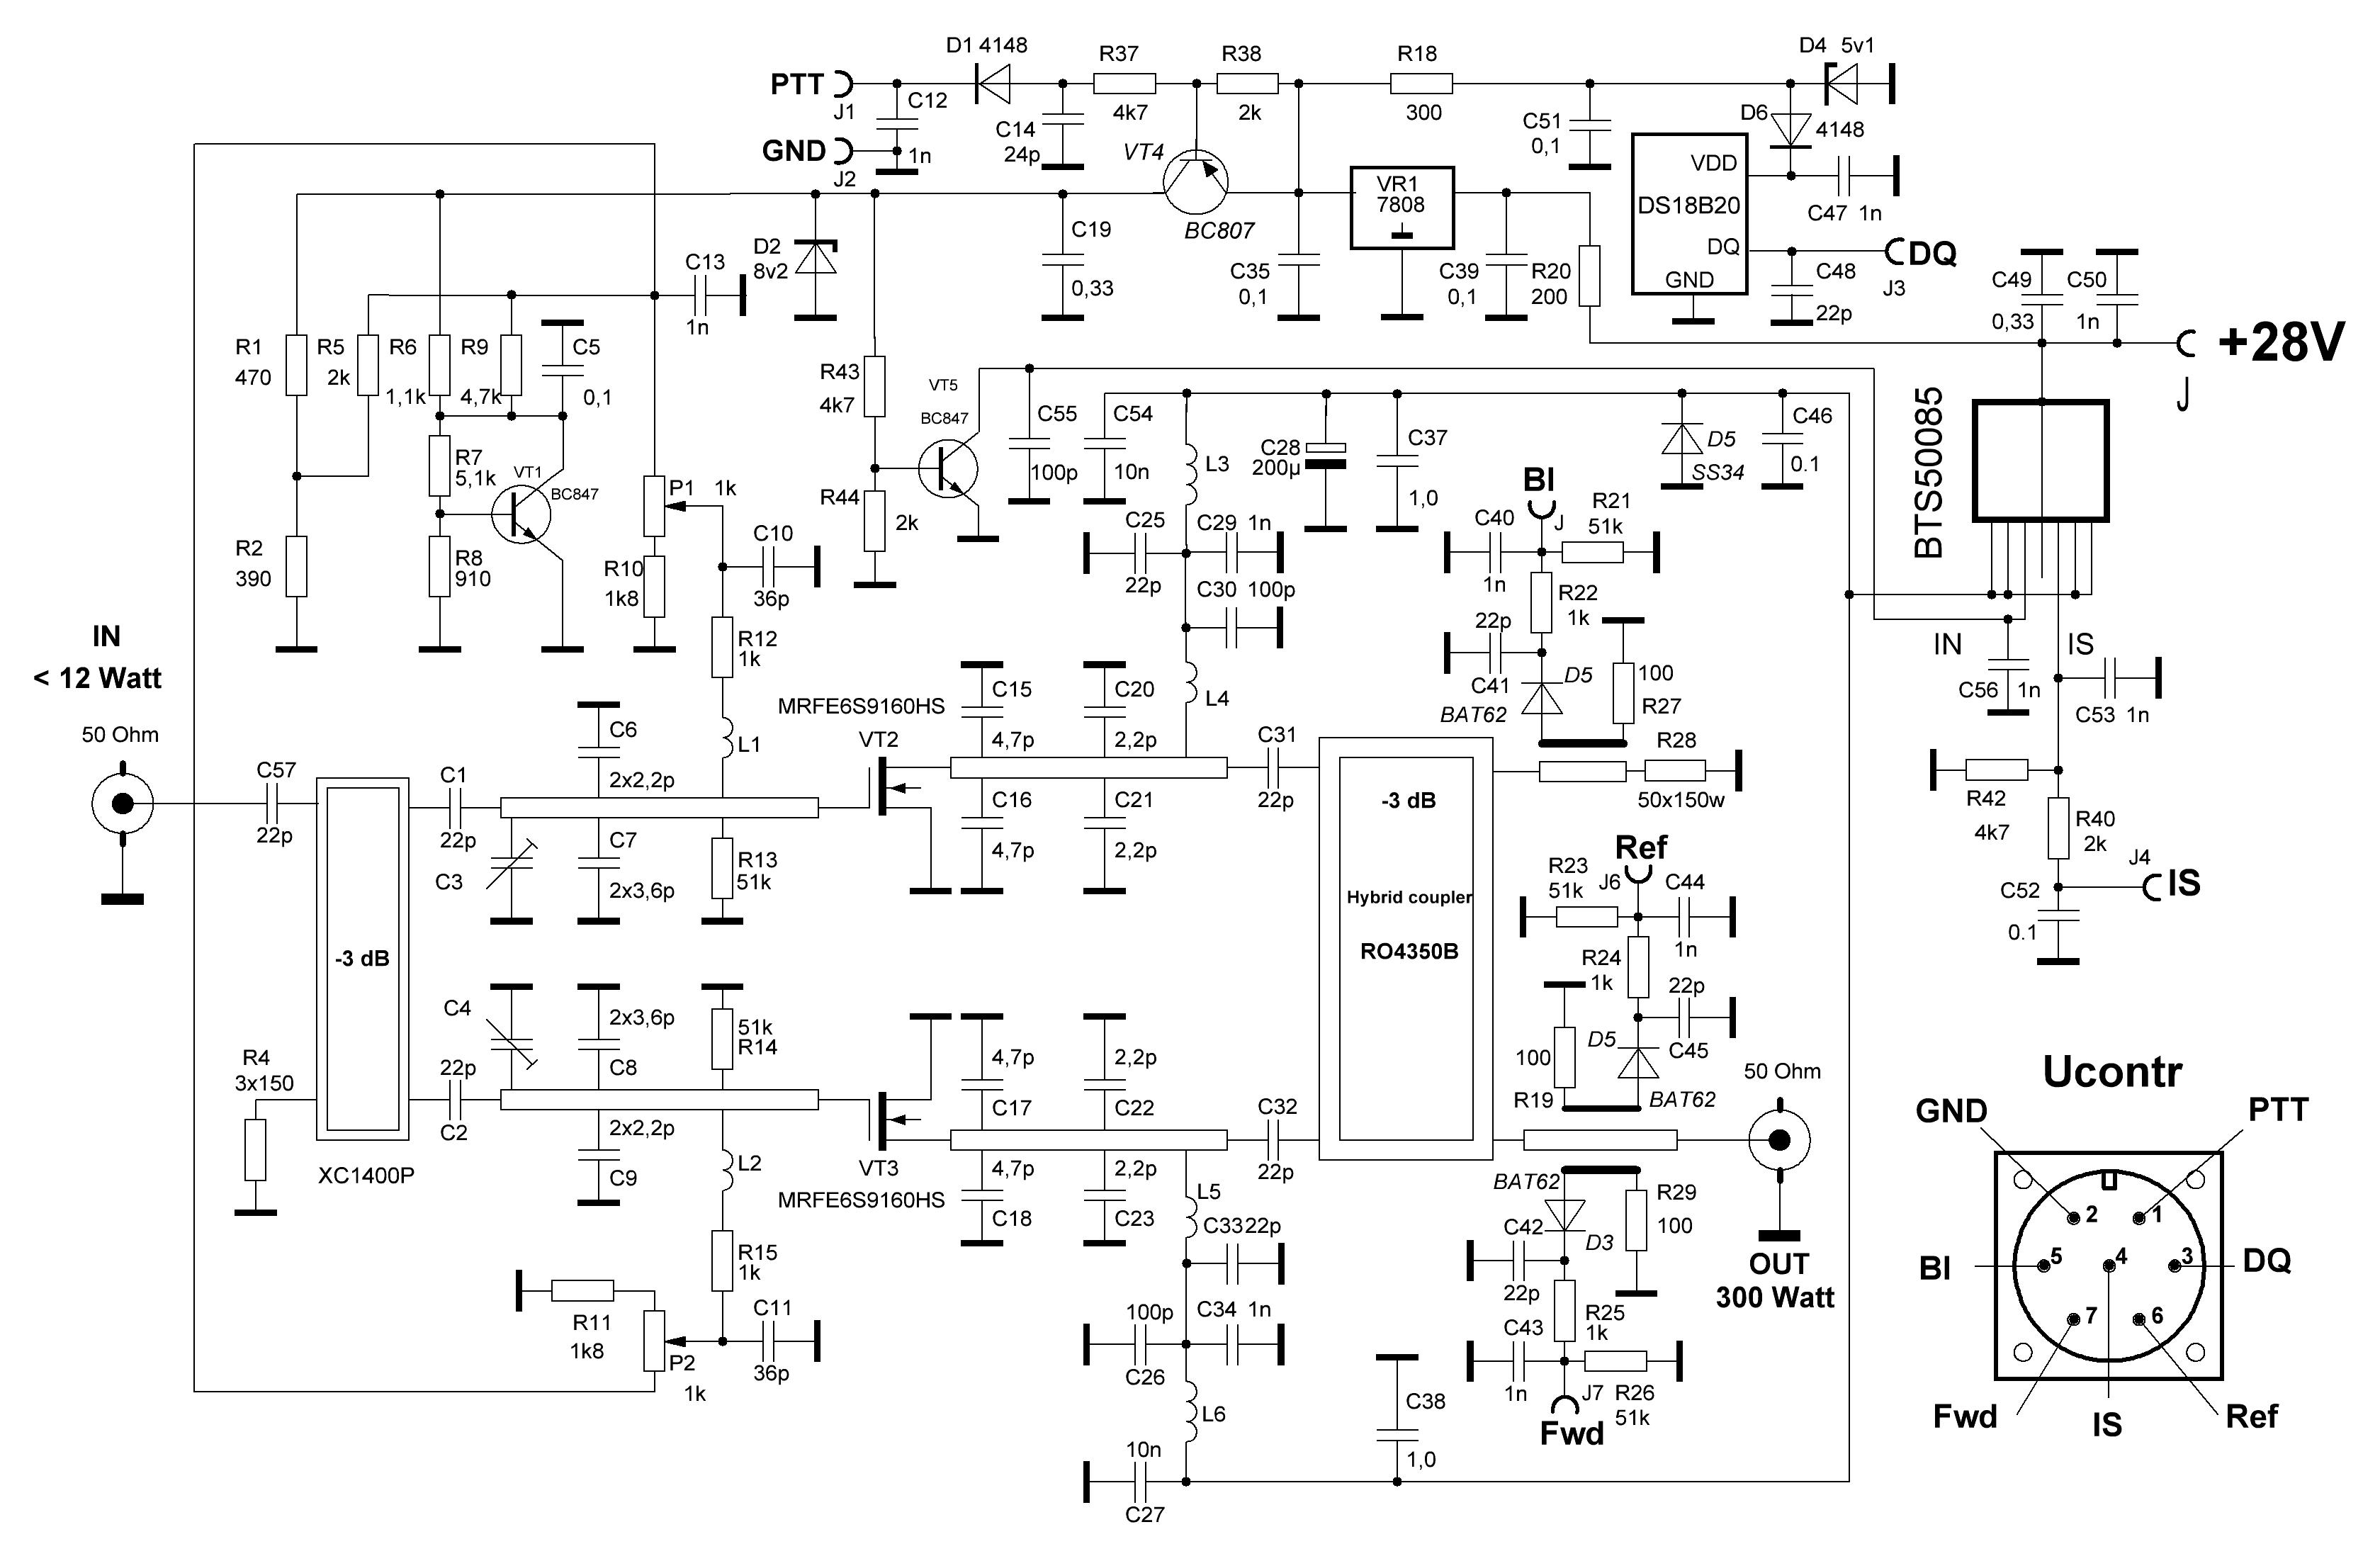 Принципиальная схема PA-23cm-12W-IN-300W-OUT-pallet от 2020-05-18